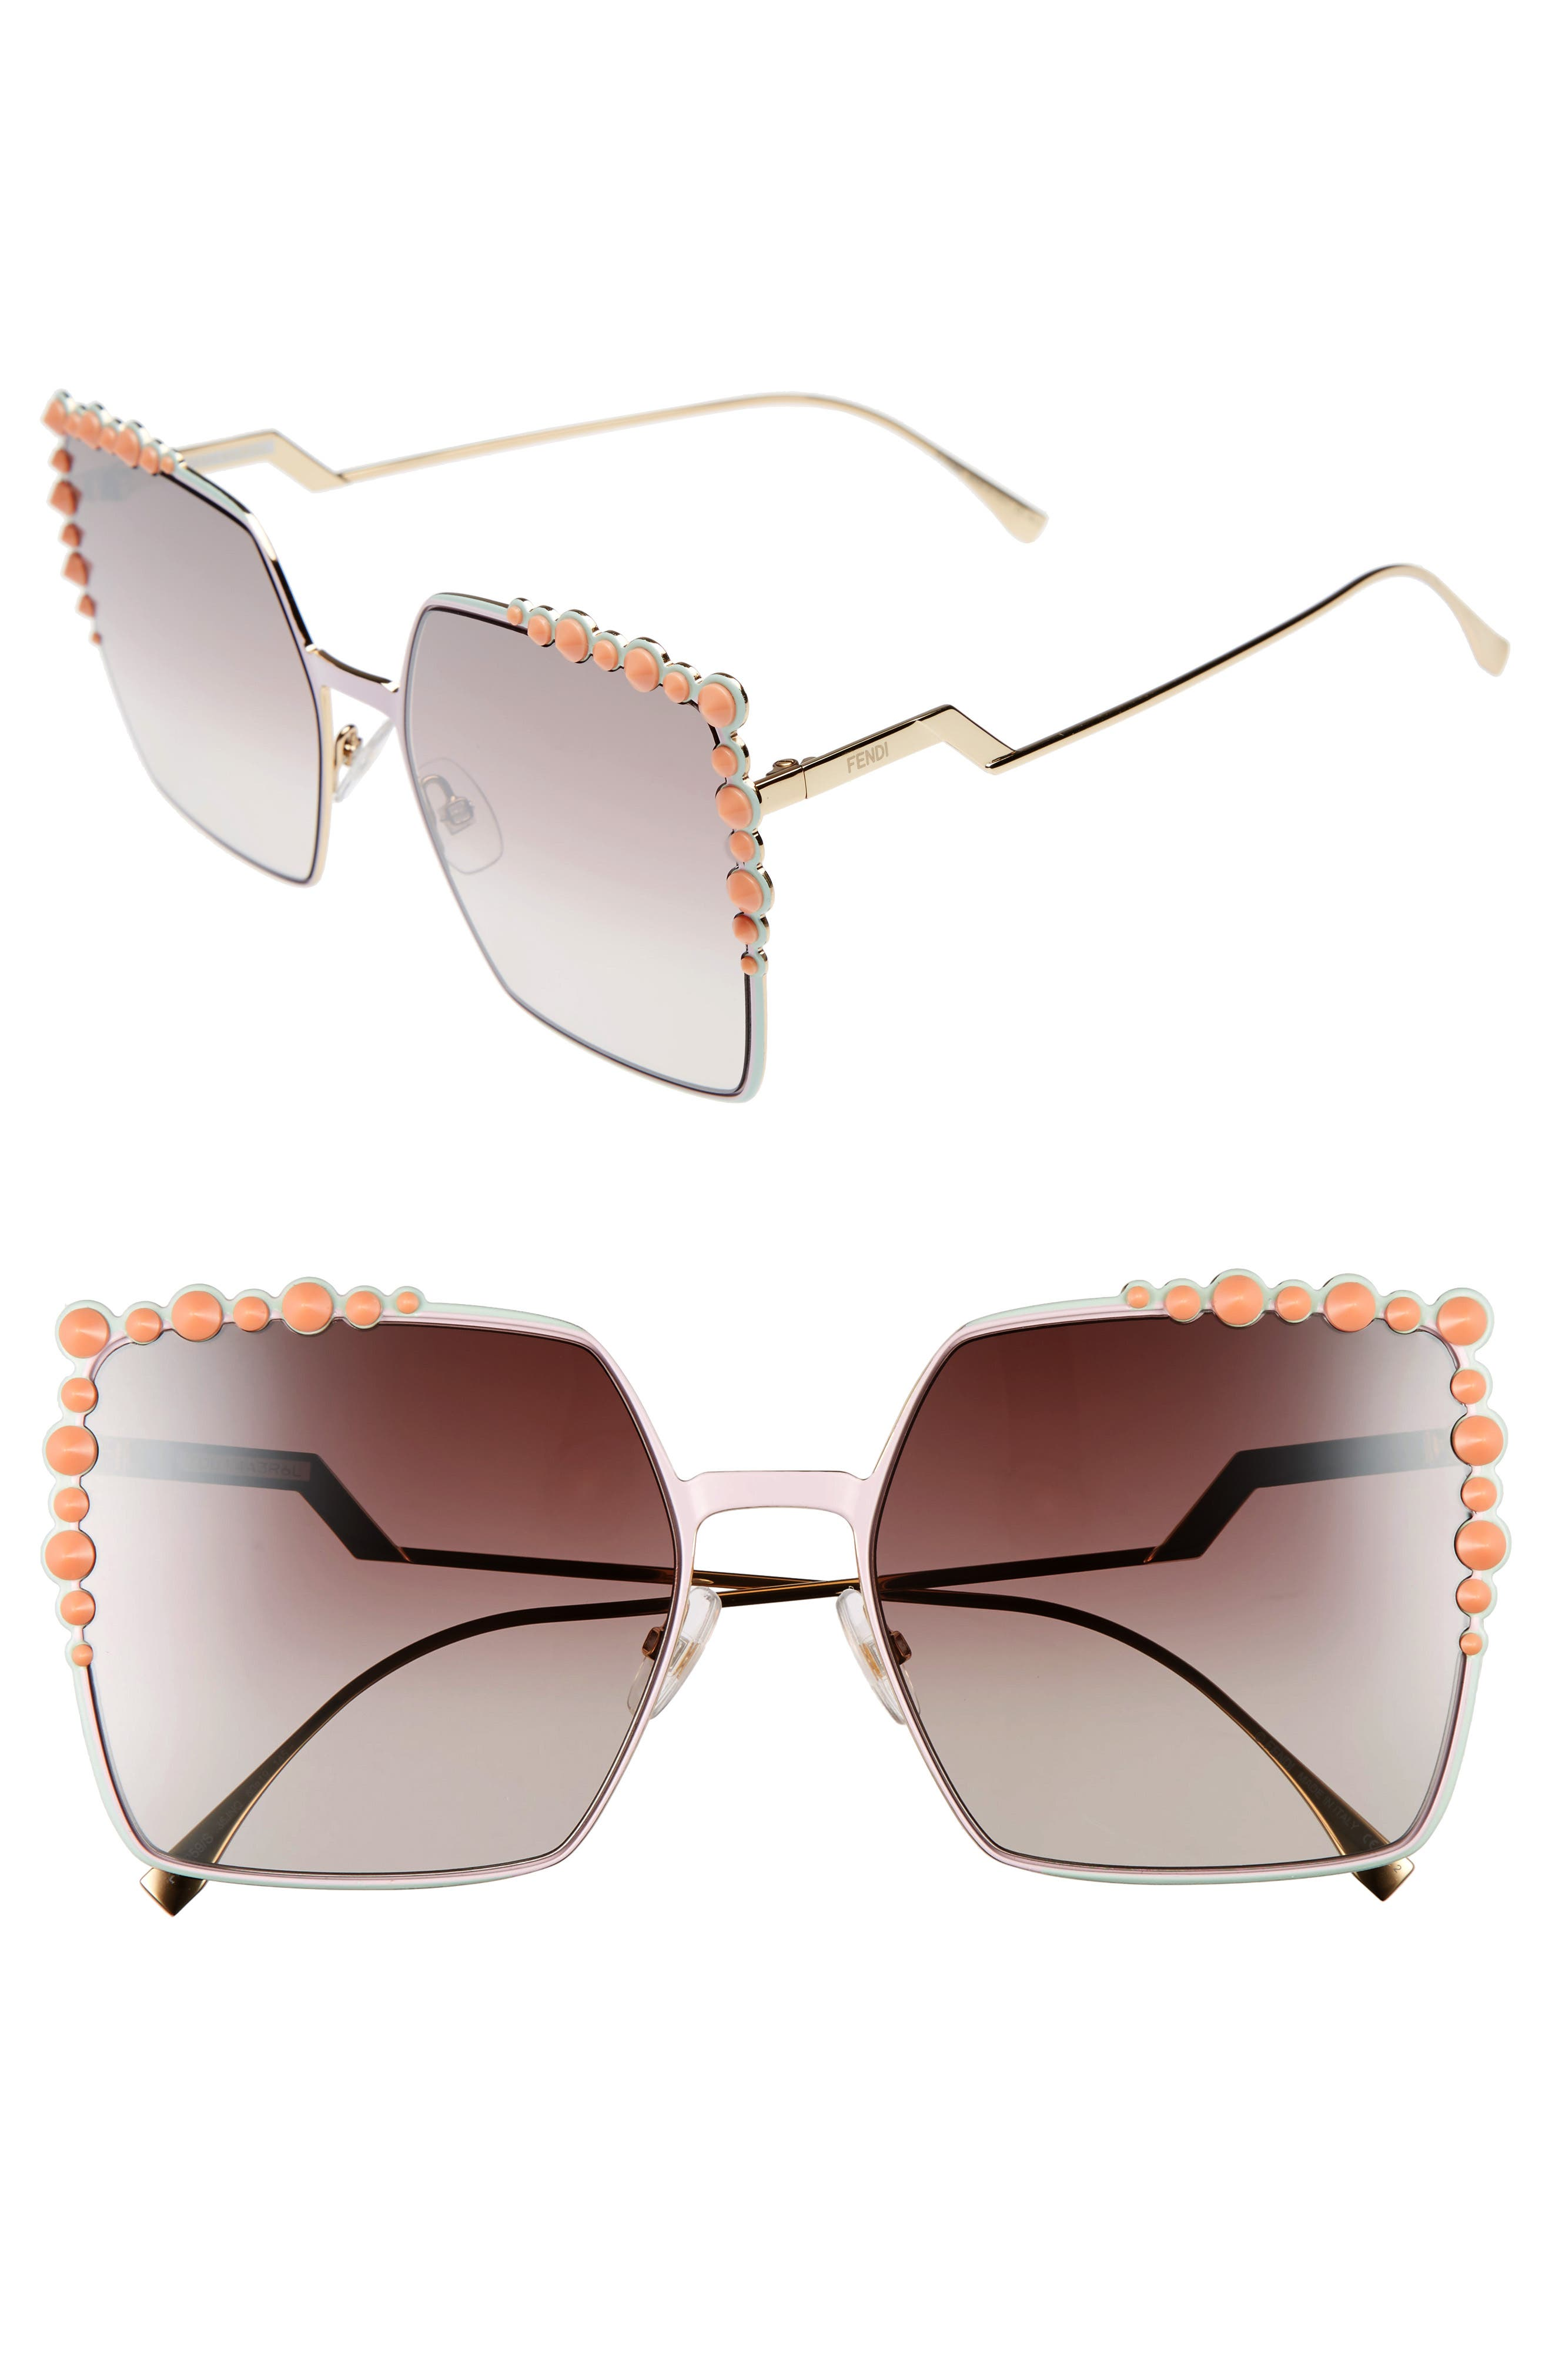 Main Image - Fendi 60mm Gradient Square Cat Eye Sunglasses